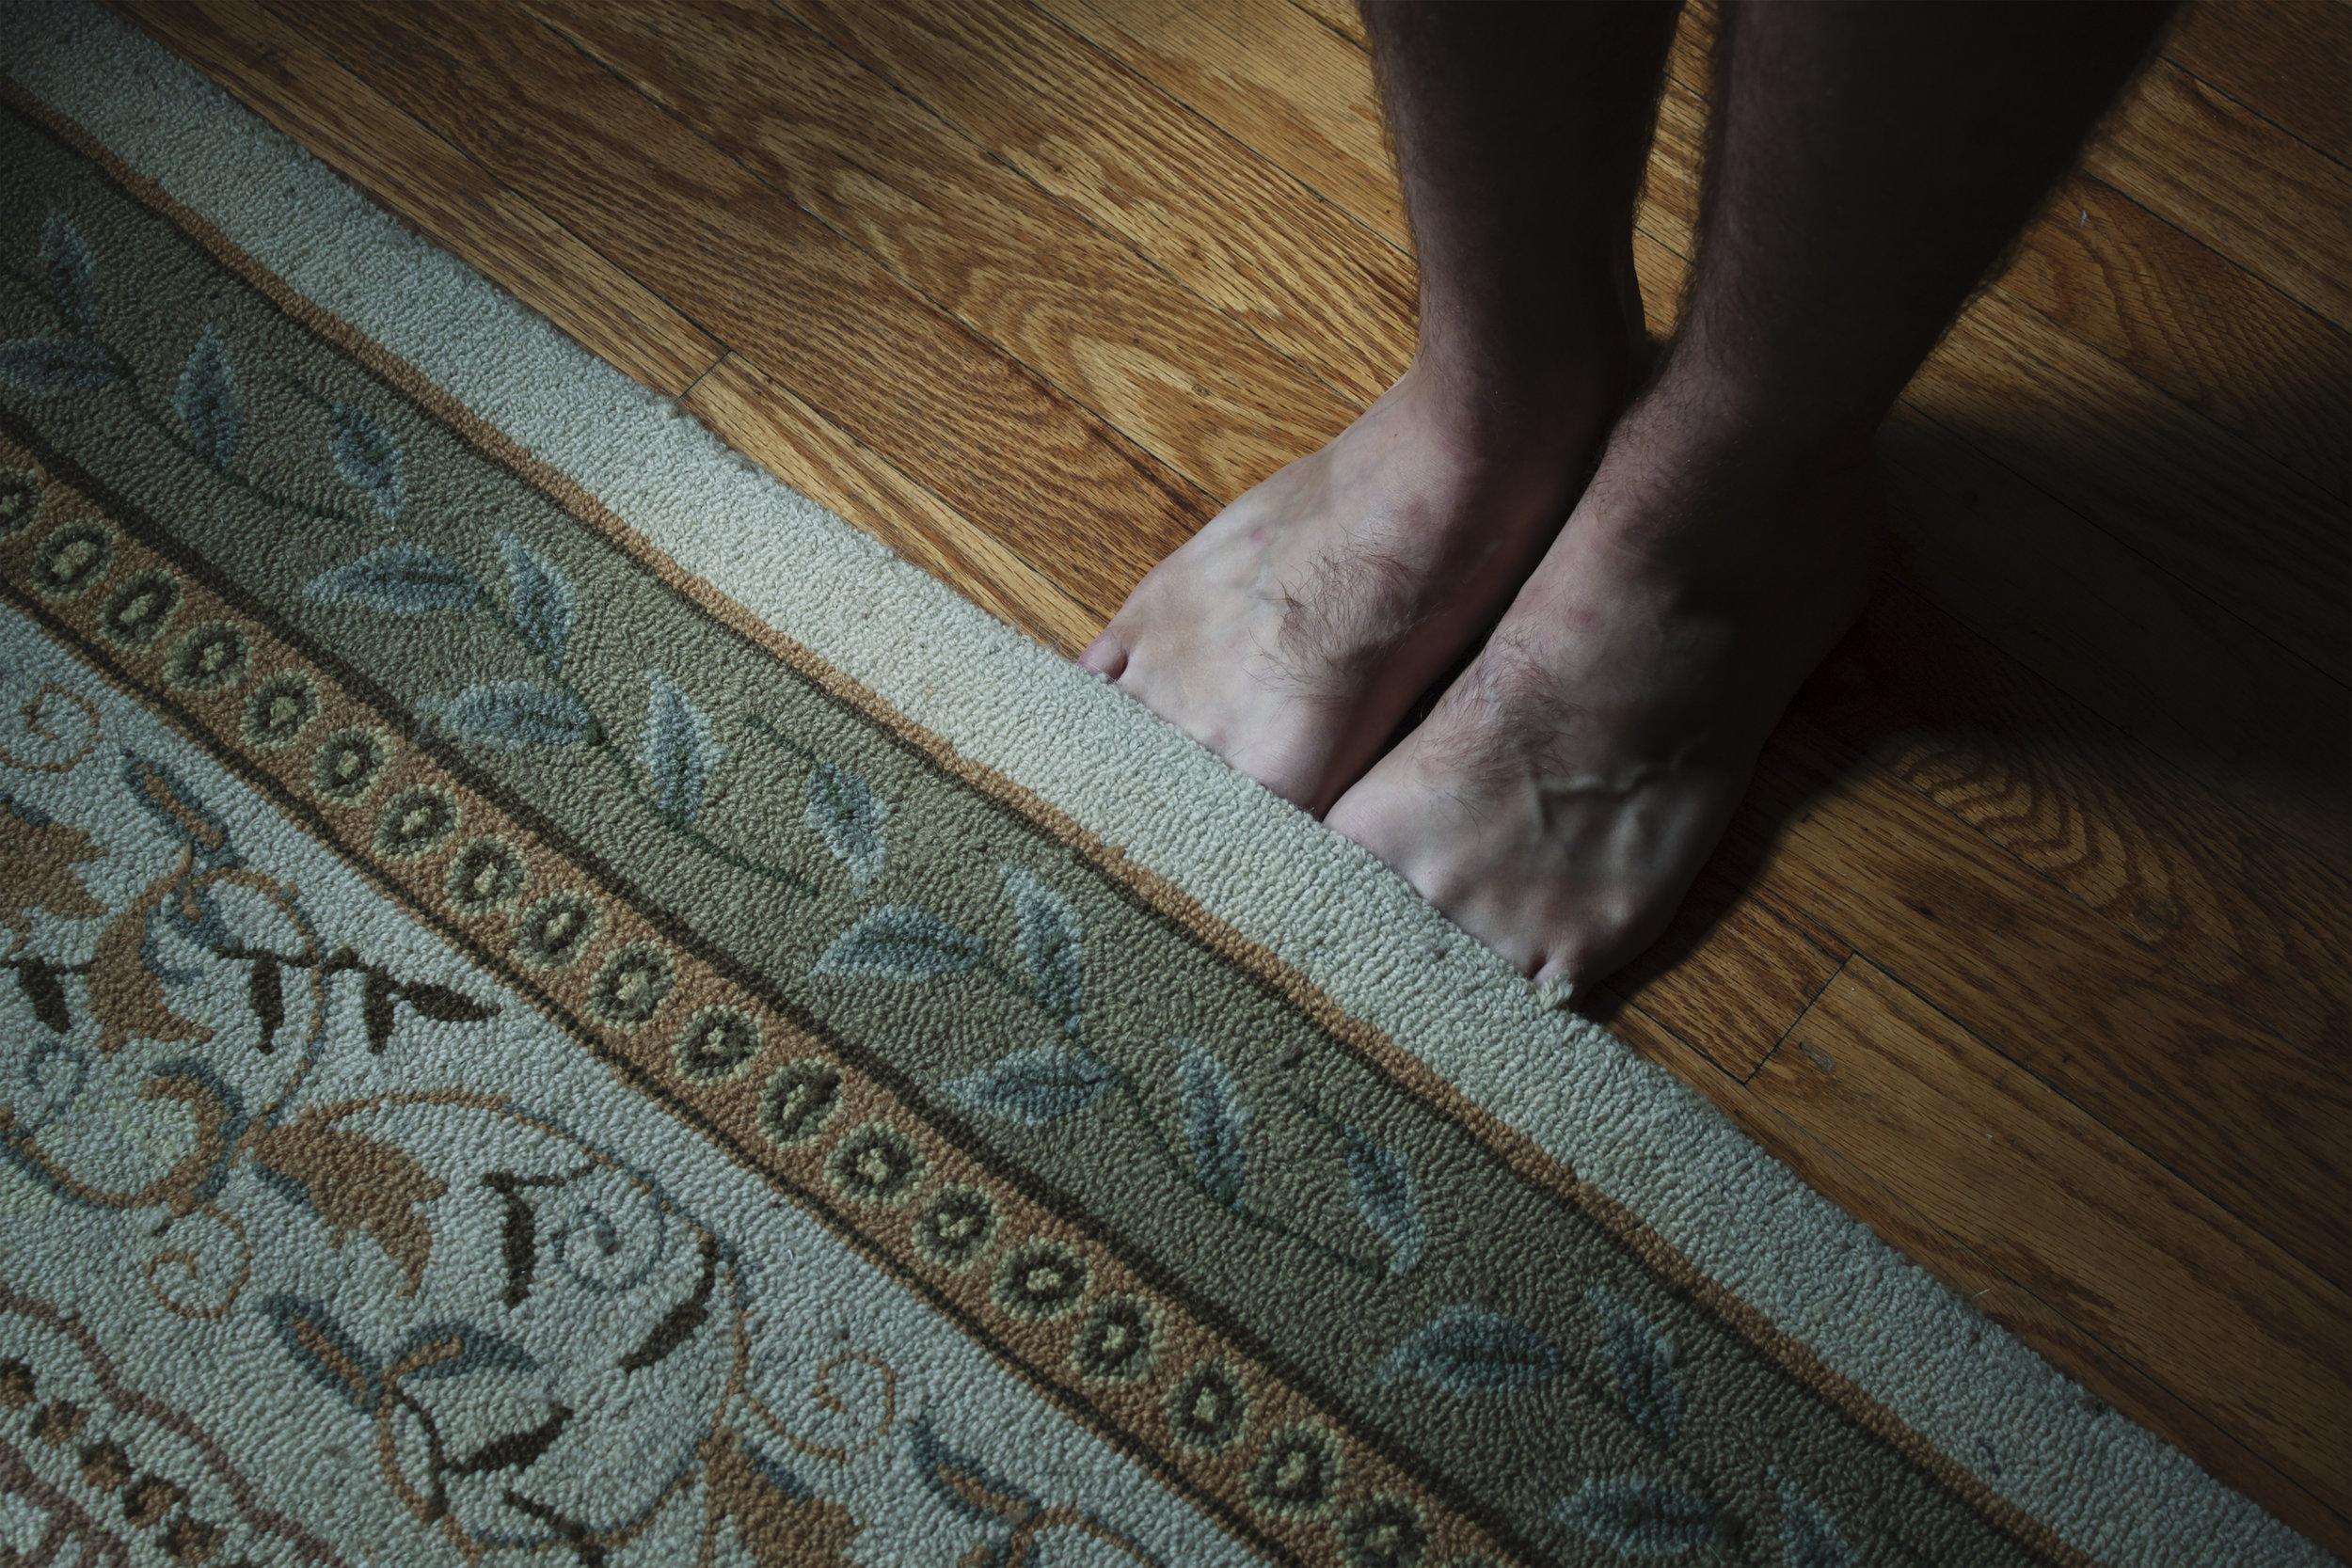 Hiding Toes Under Rug, 2018